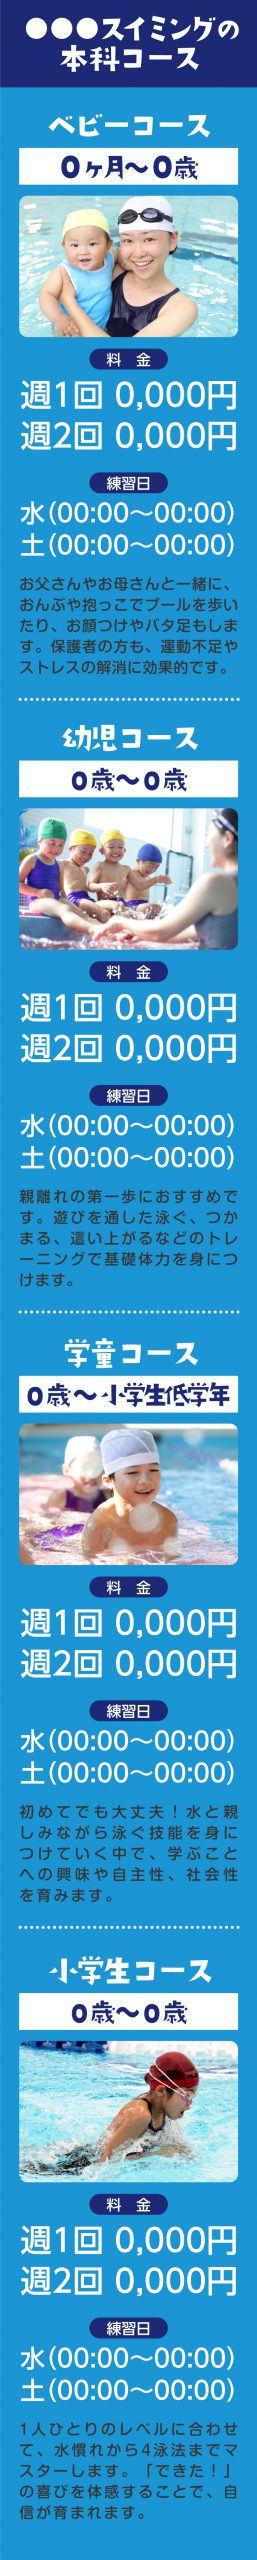 cv-case-ch-20h_b-02-3